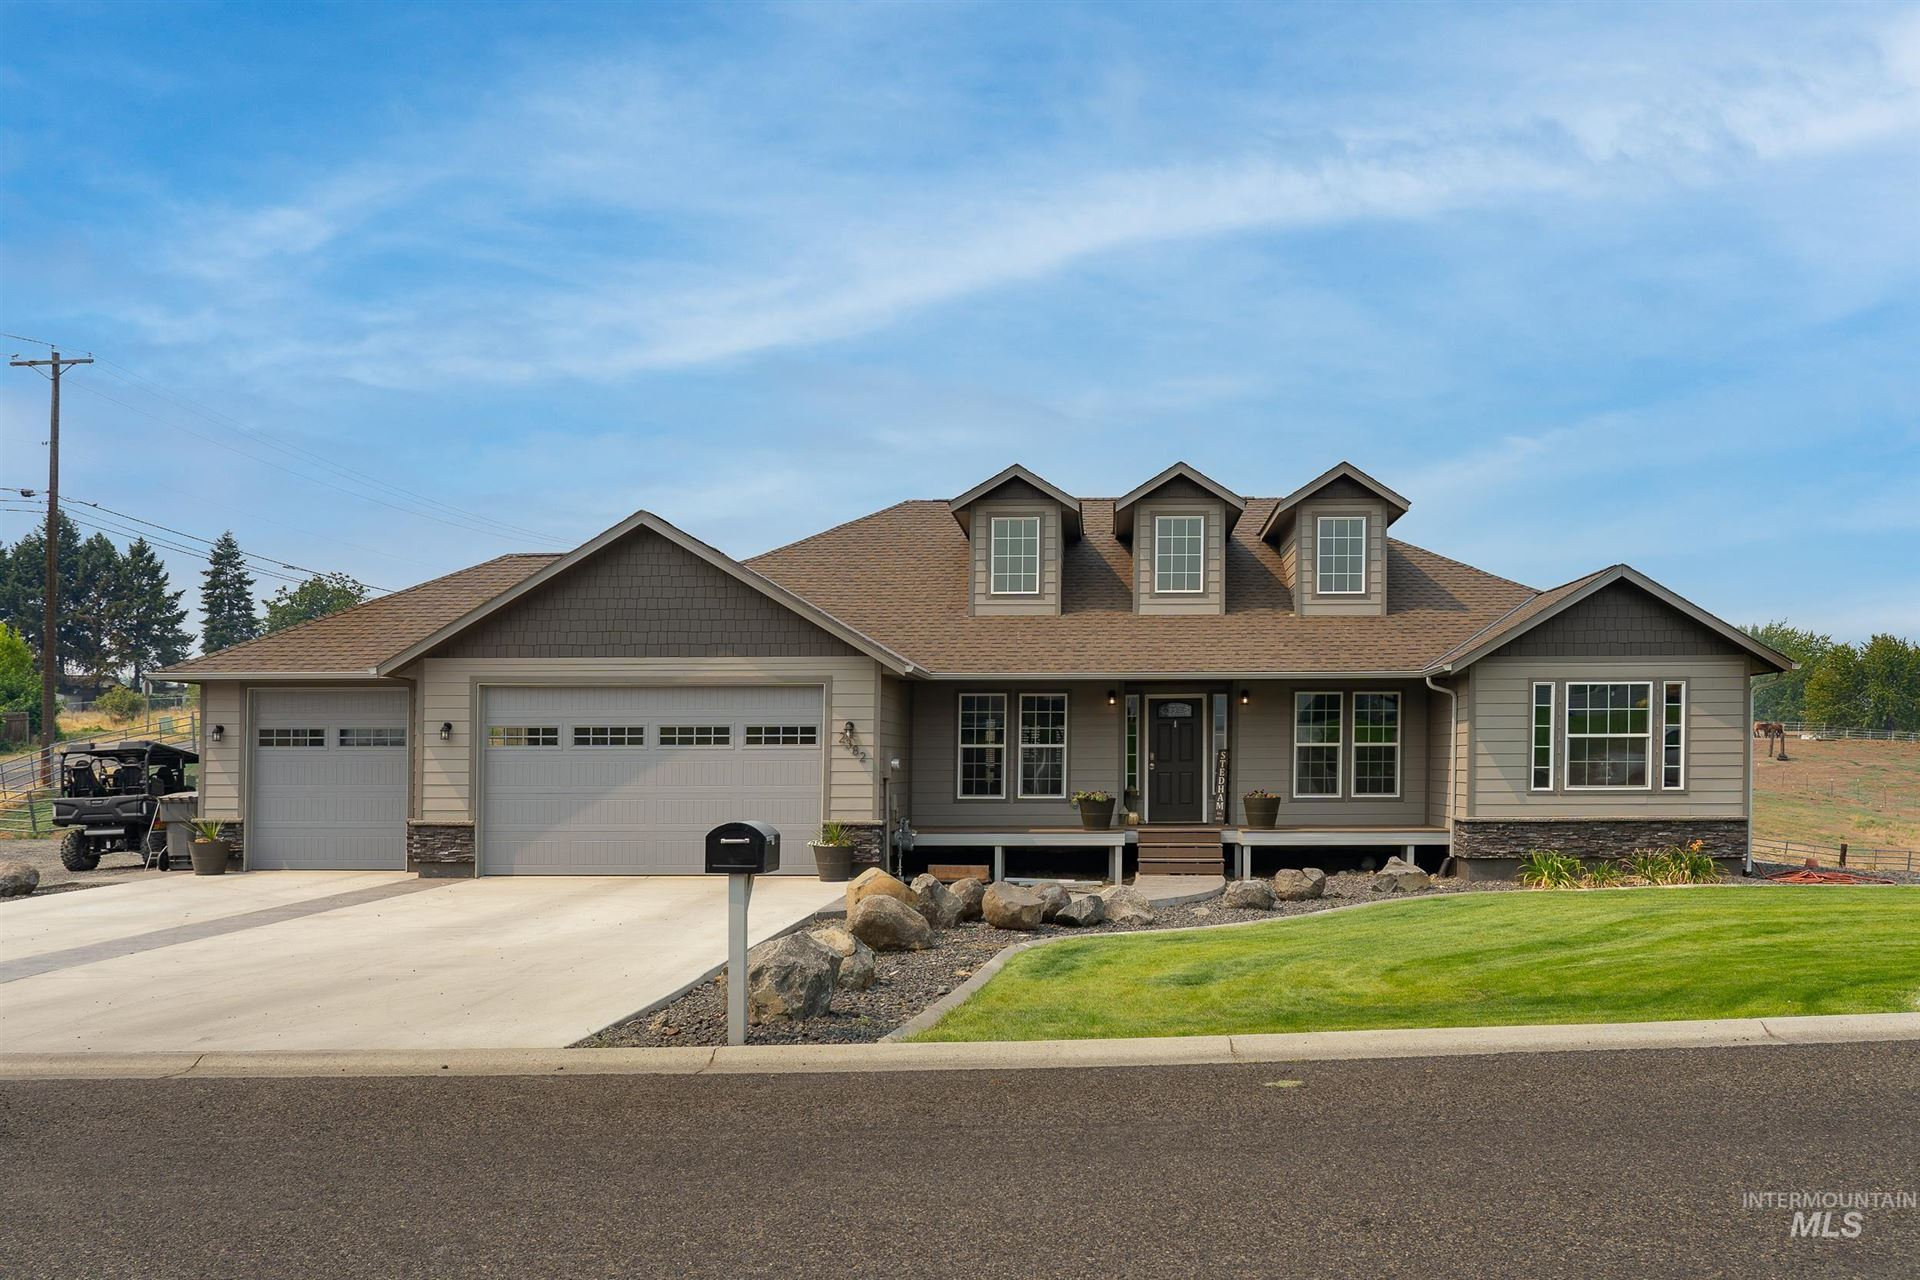 2382 Ridgeview Drive, Clarkston, WA 99403 - MLS#: 98814045